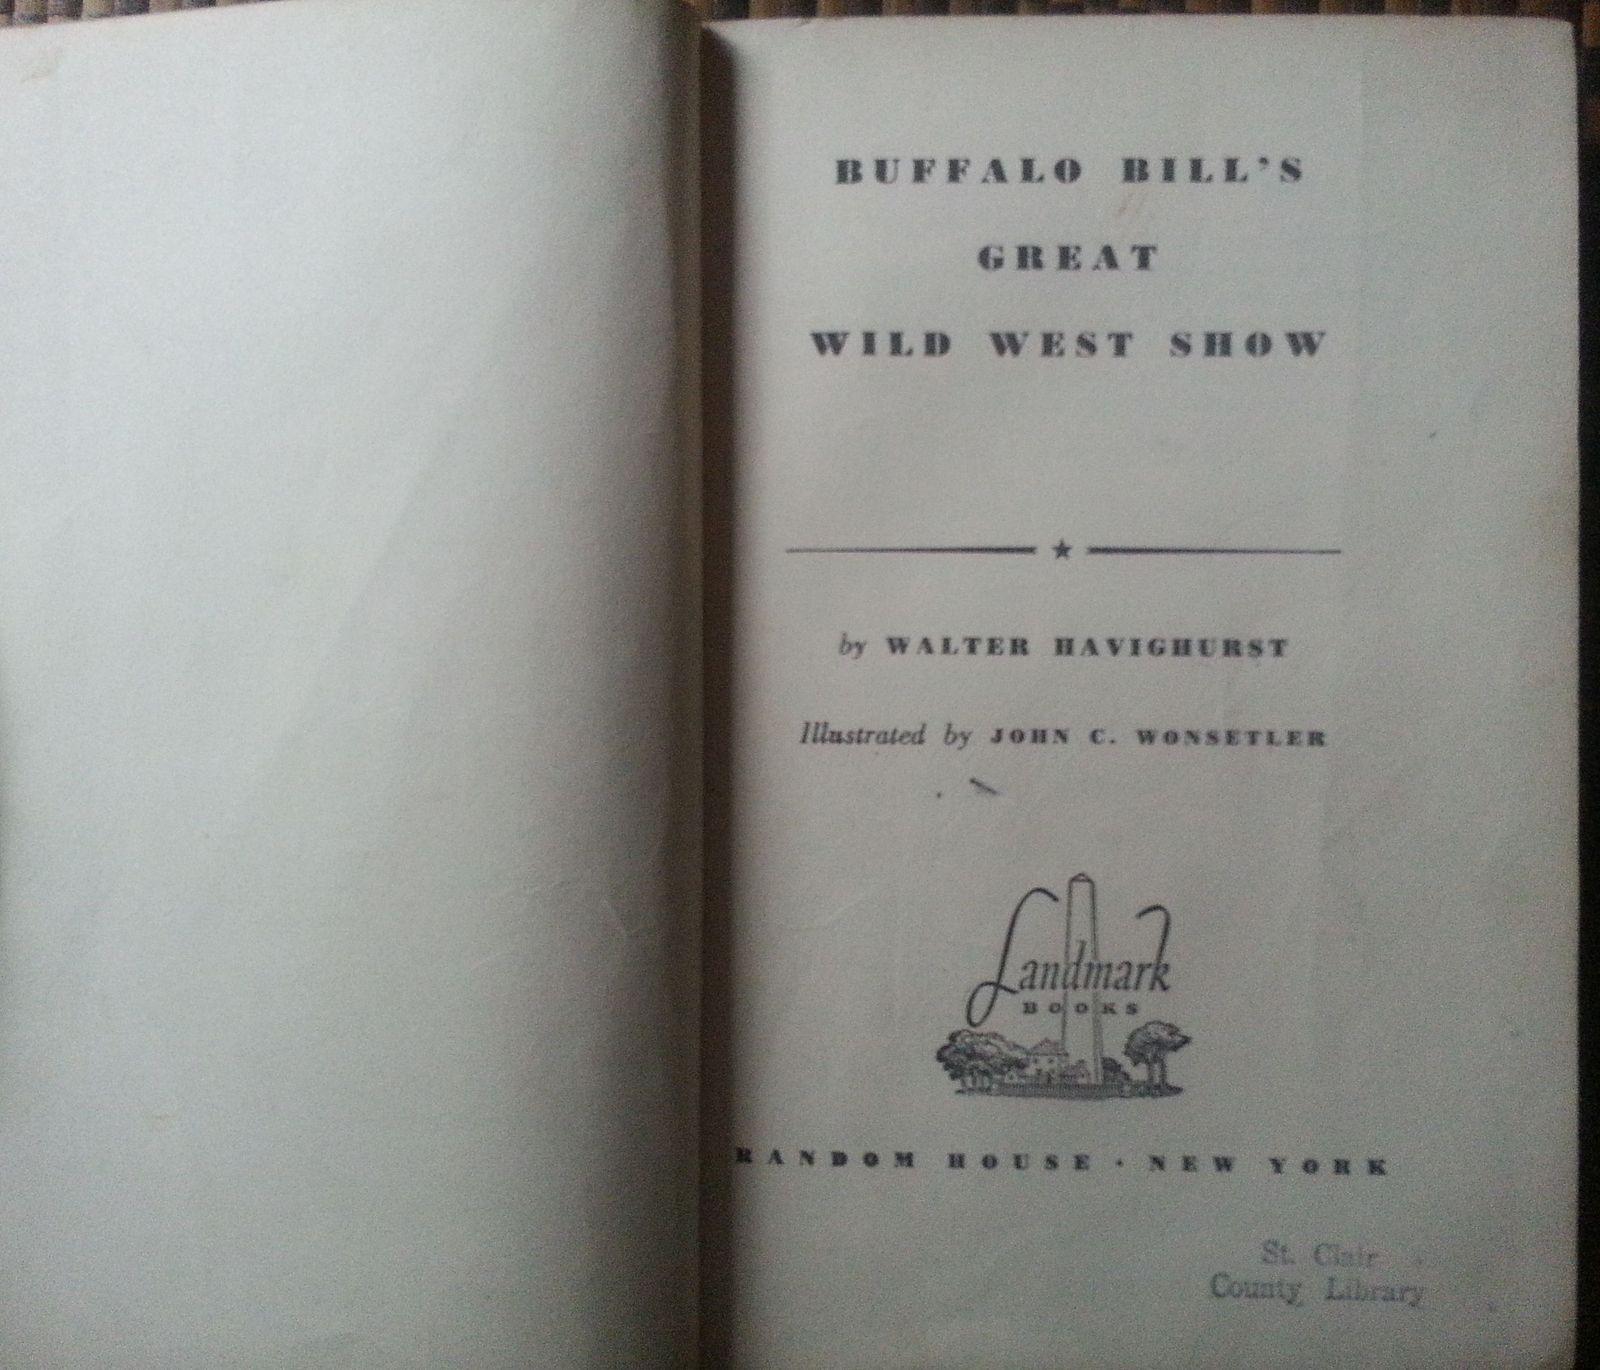 Buffalo Bill's Great Wild West Show by Walter Havighurst 1957 HB